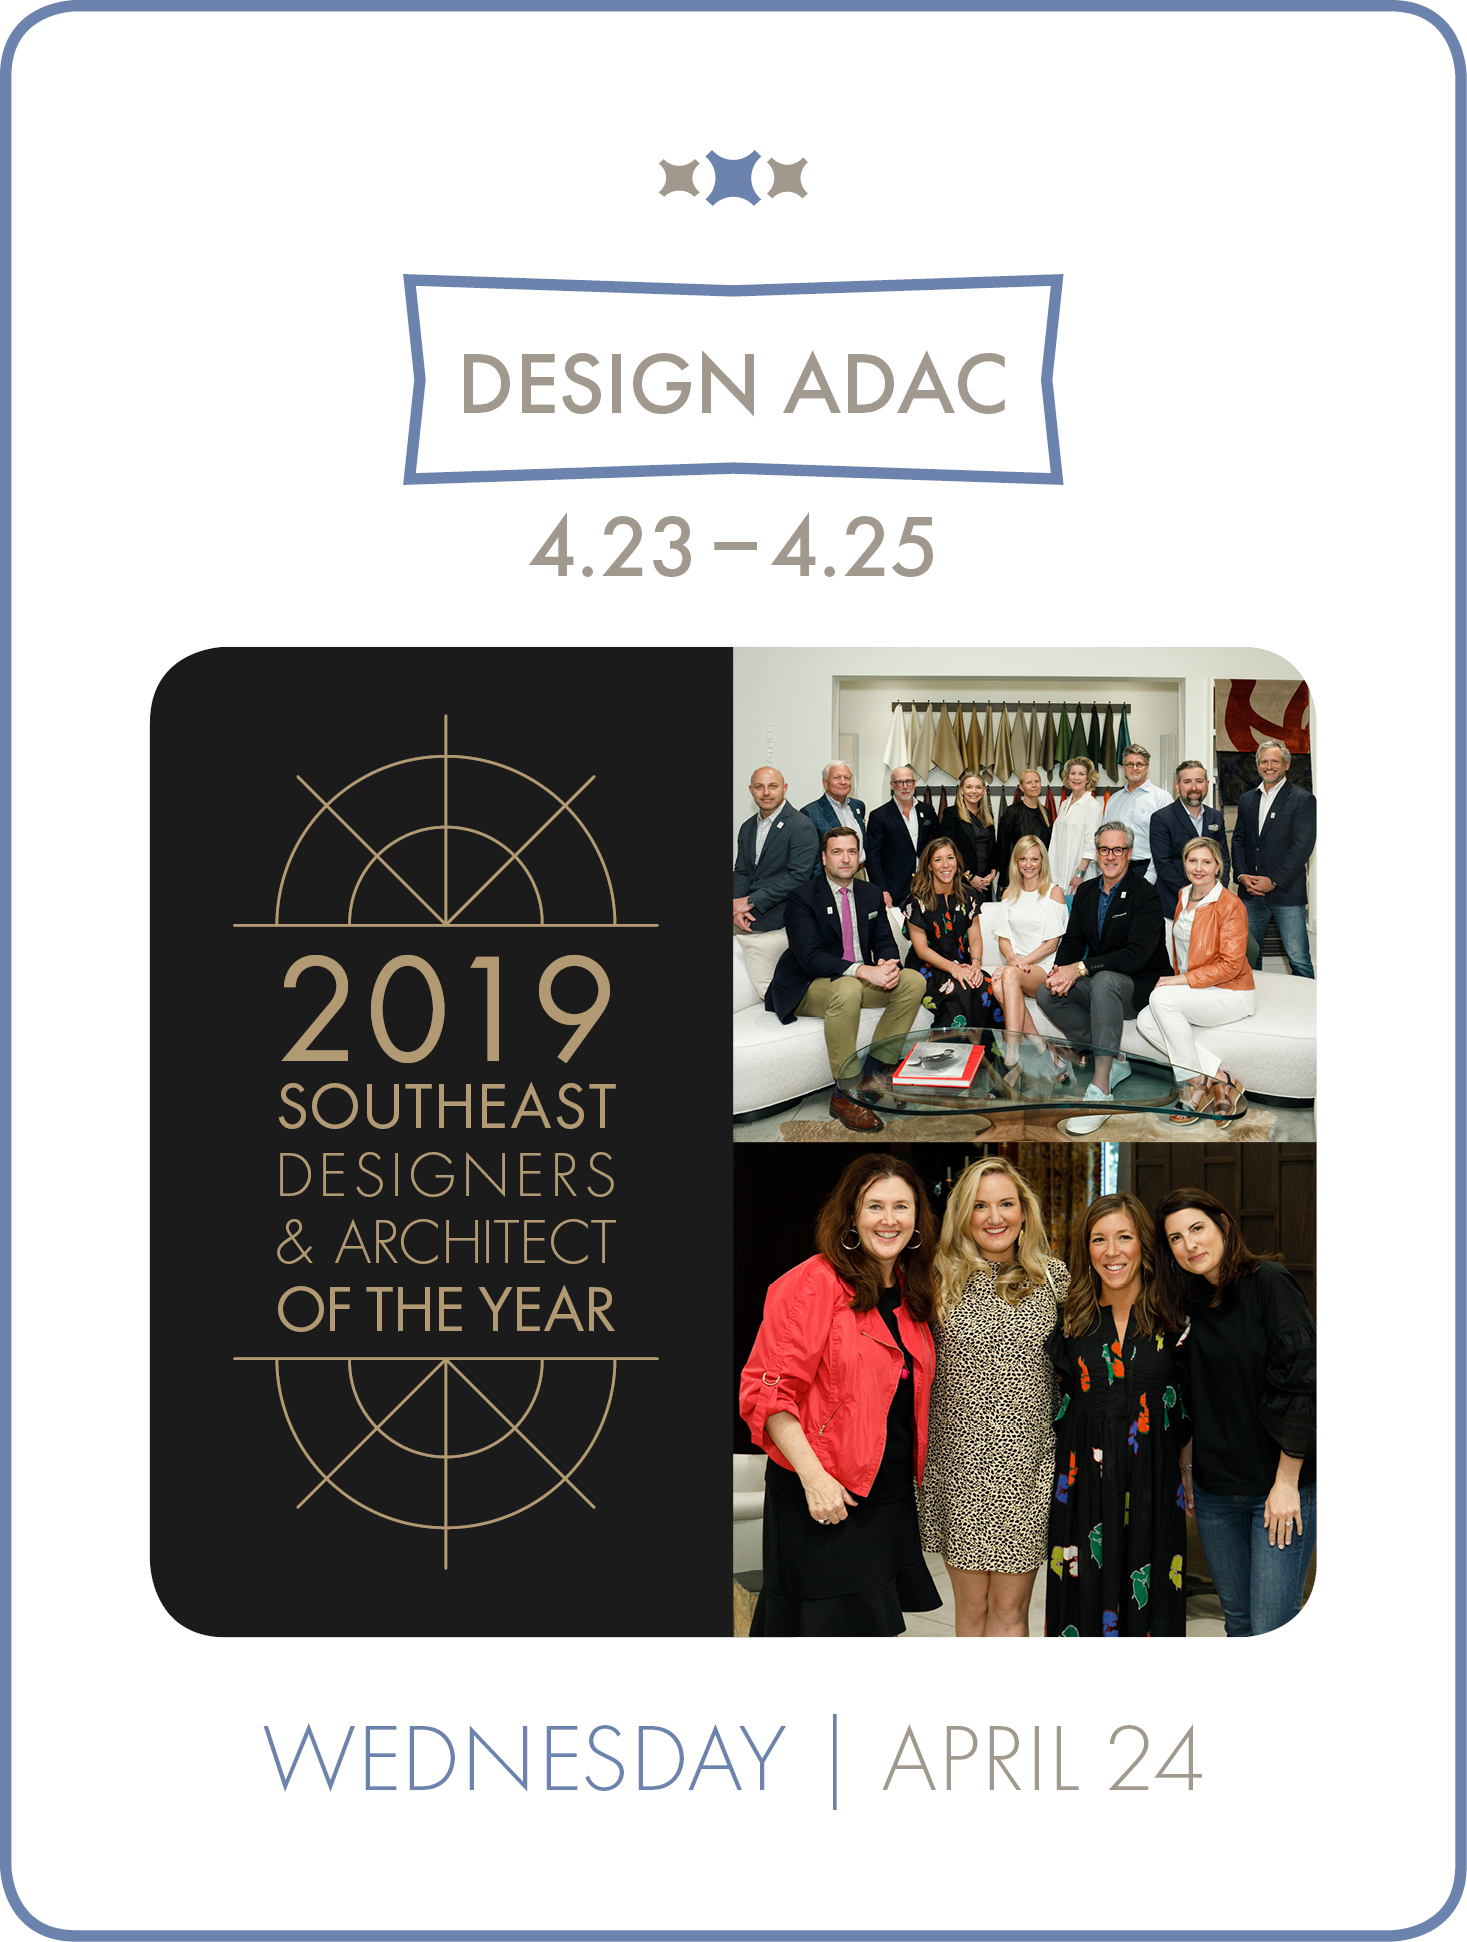 Southeast Designers & Architect of the Year Awards Finalists Celebration at DESIGN ADAC, Fulton, Georgia, United States